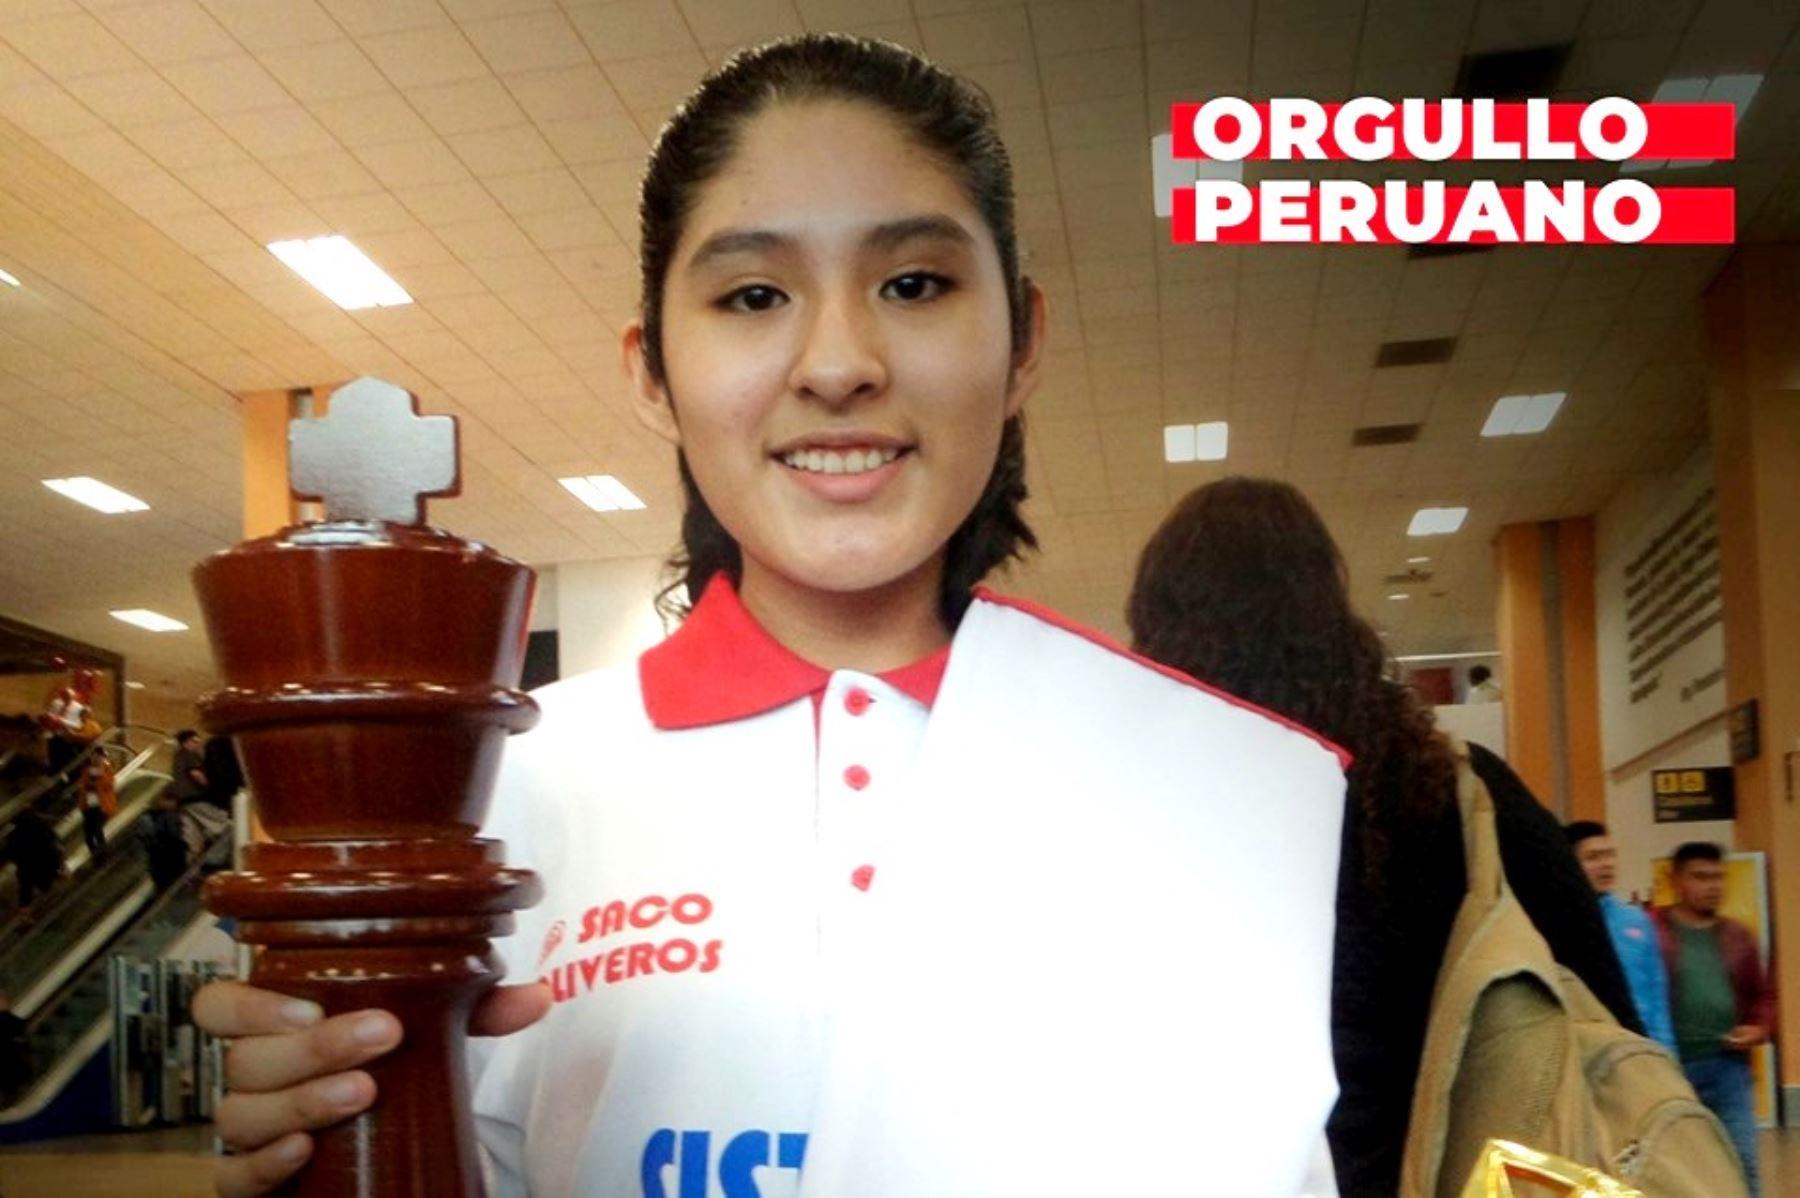 La escolar peruana Fiorella Contreras se coronó tricampeona de ajedrez. Foto: ANDINA/difusión.